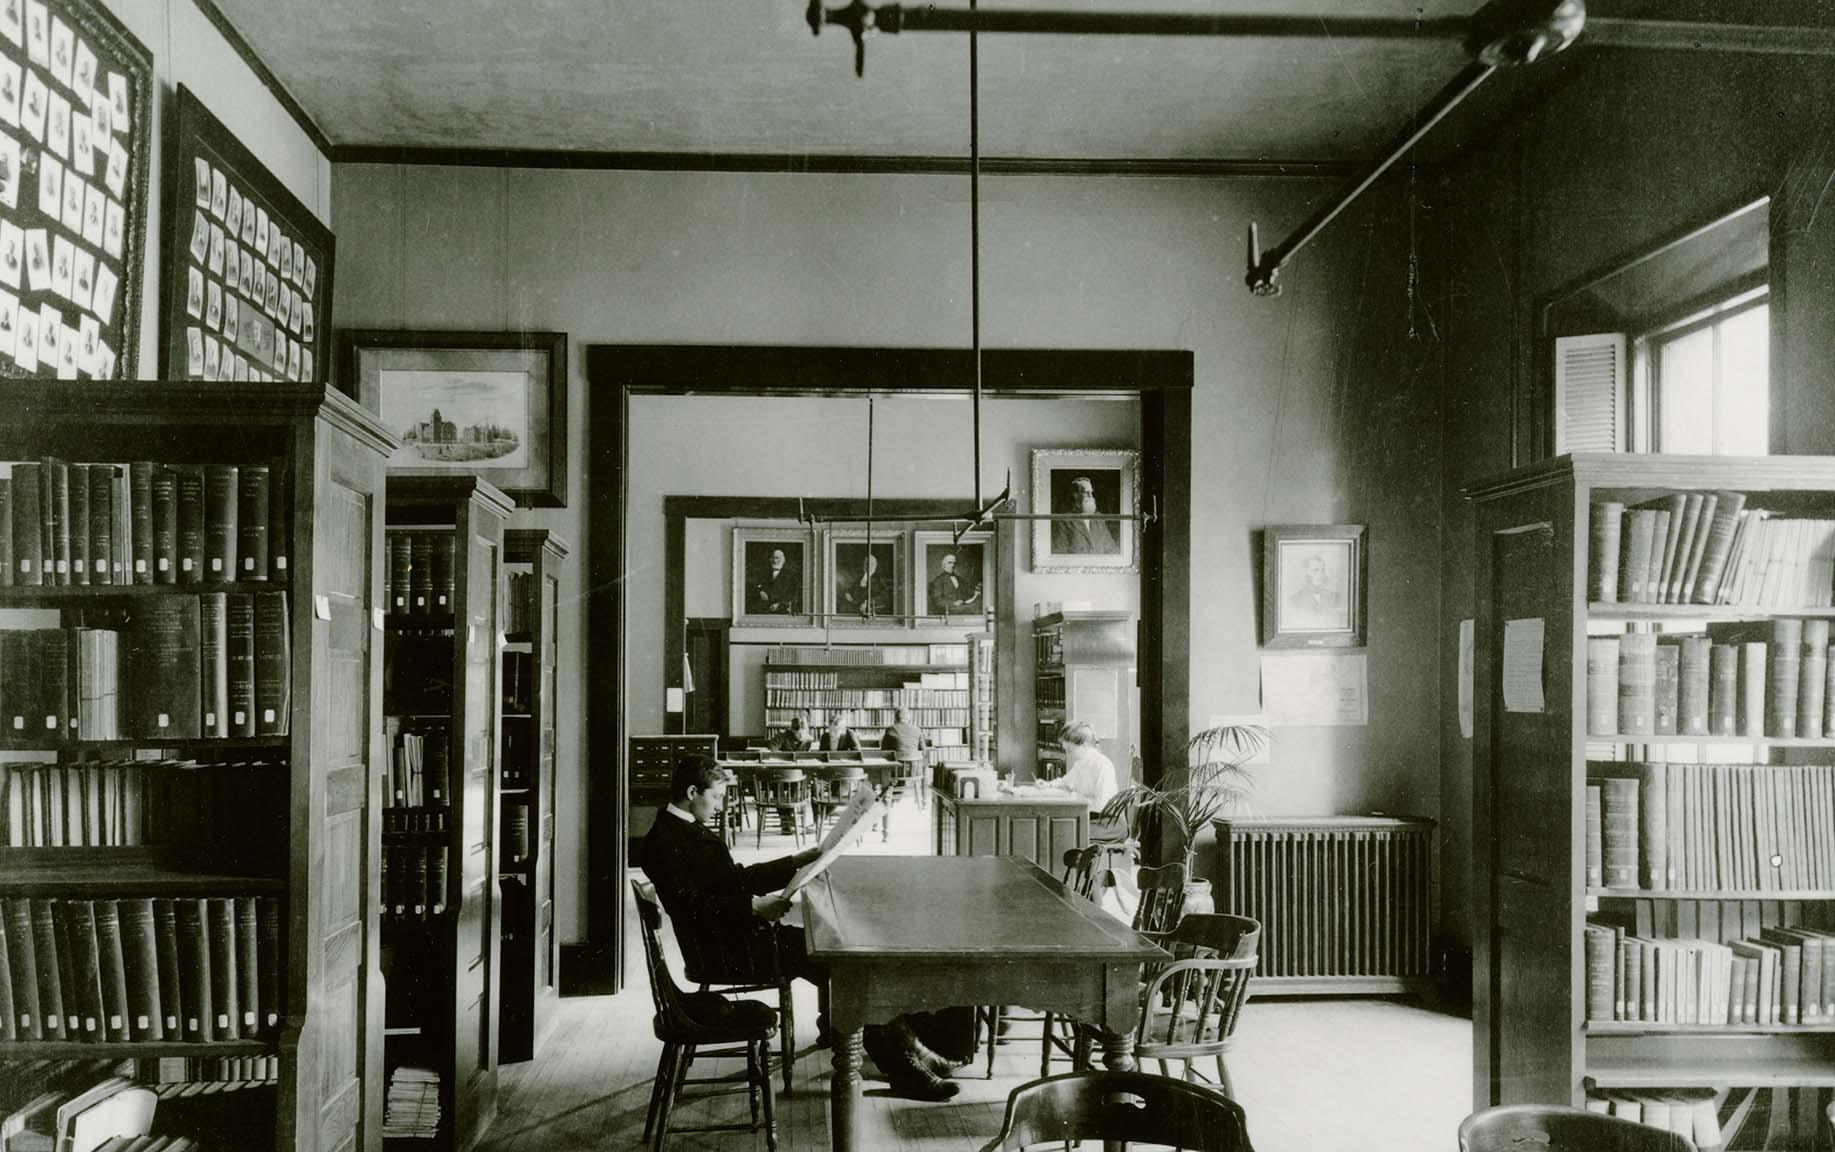 Library in Boynton Hall